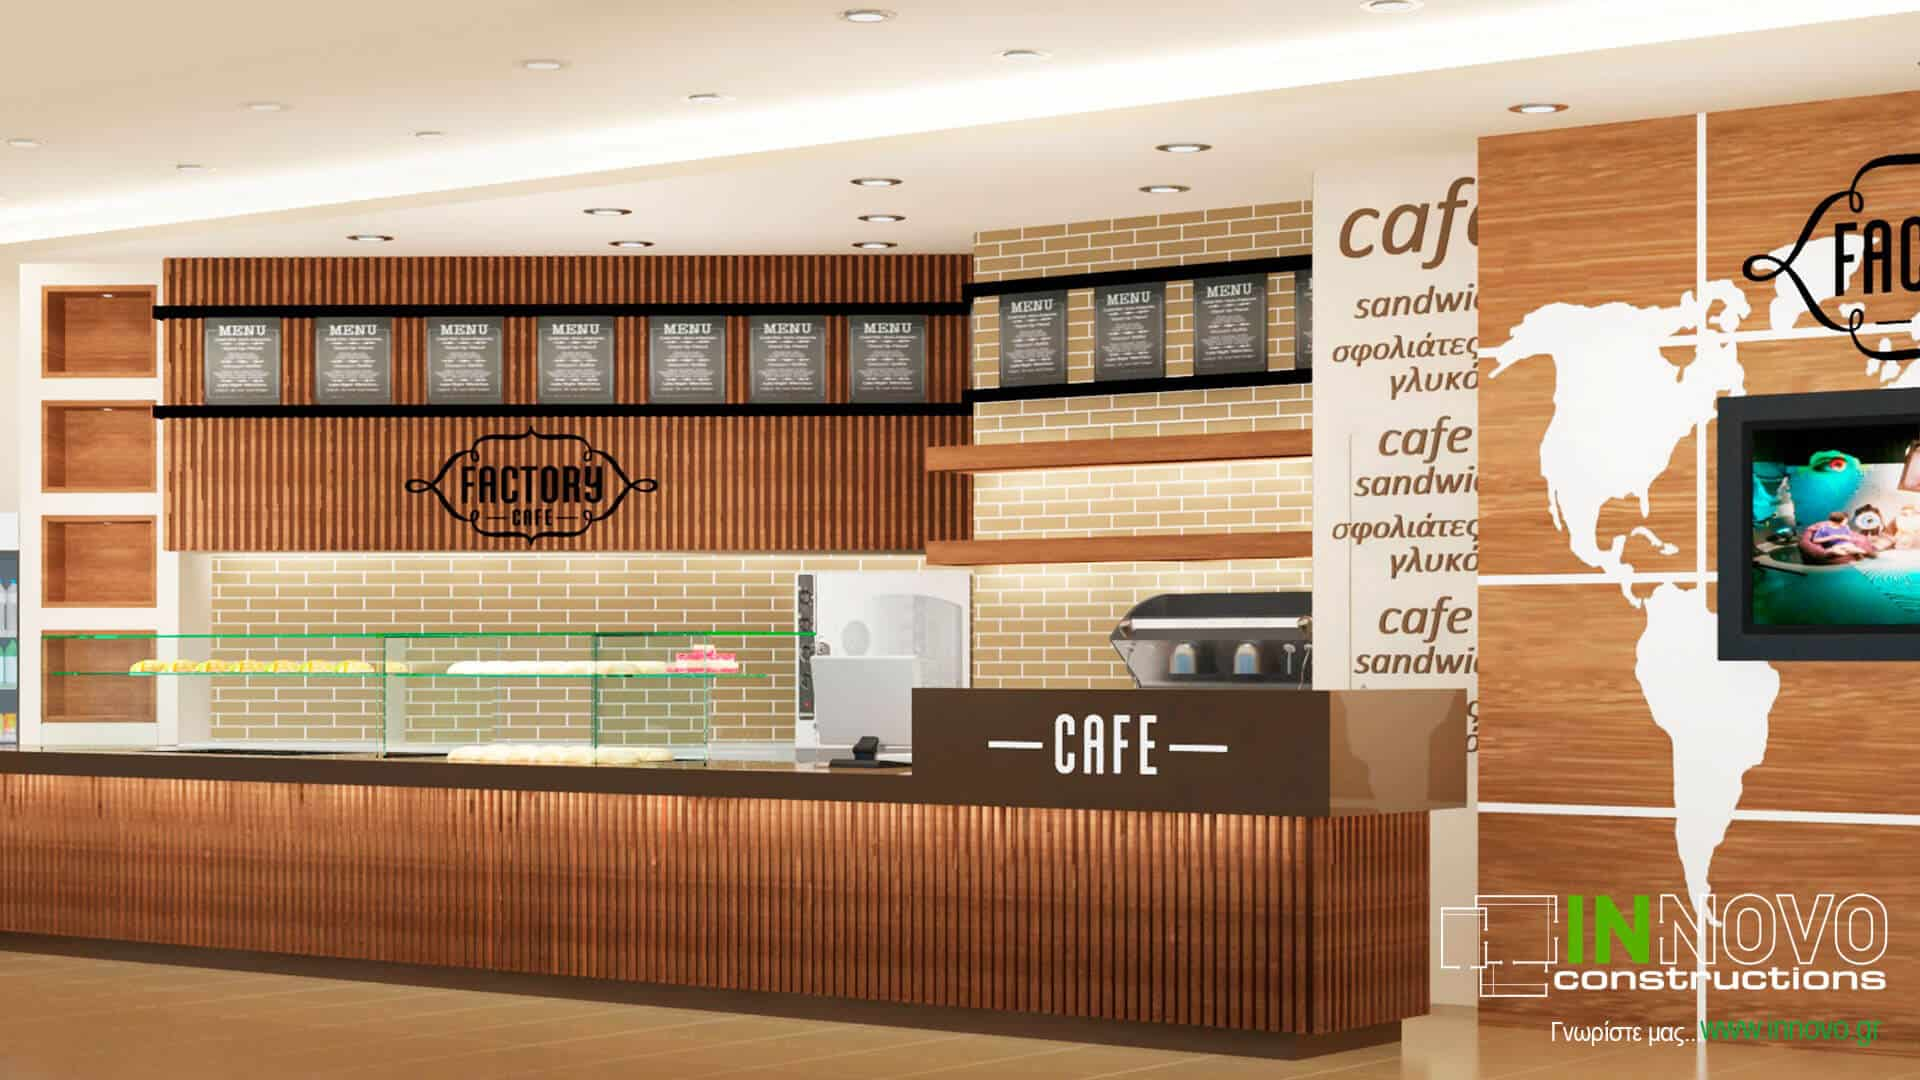 kataskevi-snack-cafe-construction-snack-gerakas-1842-9